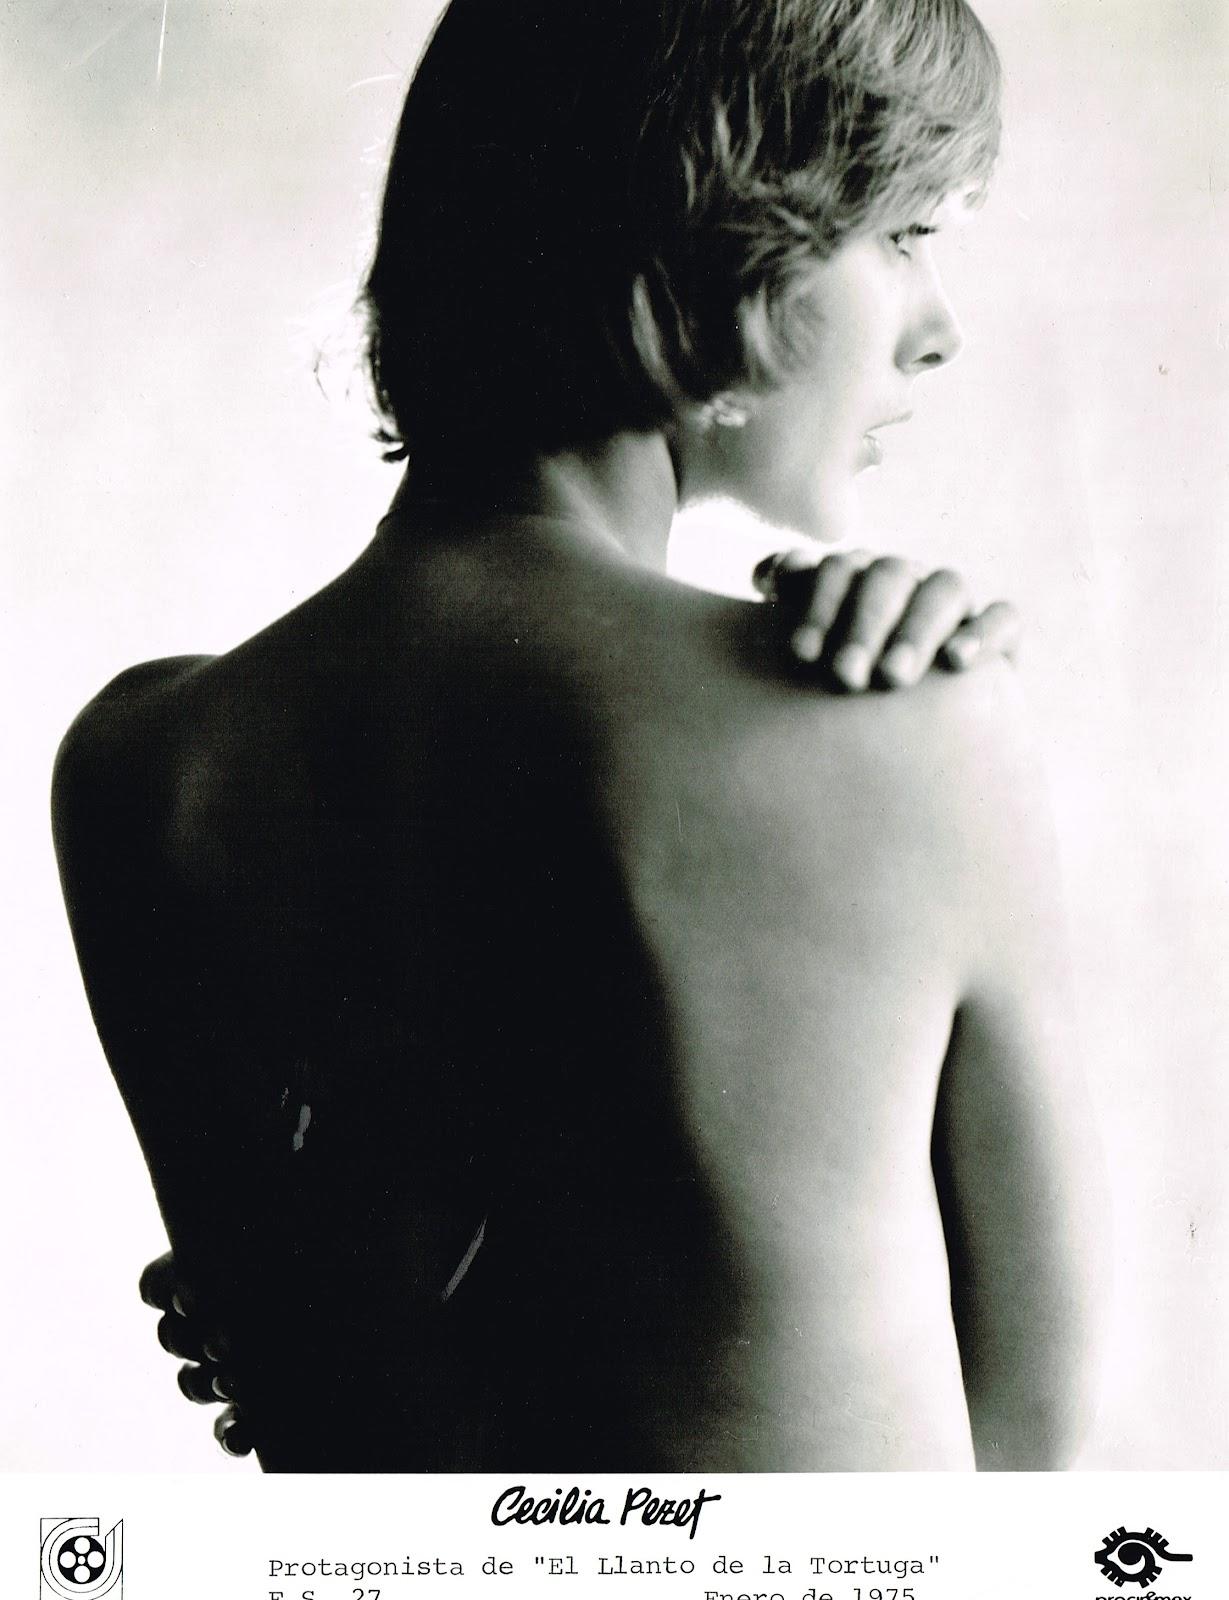 Cecilia Pezet Nude Photos